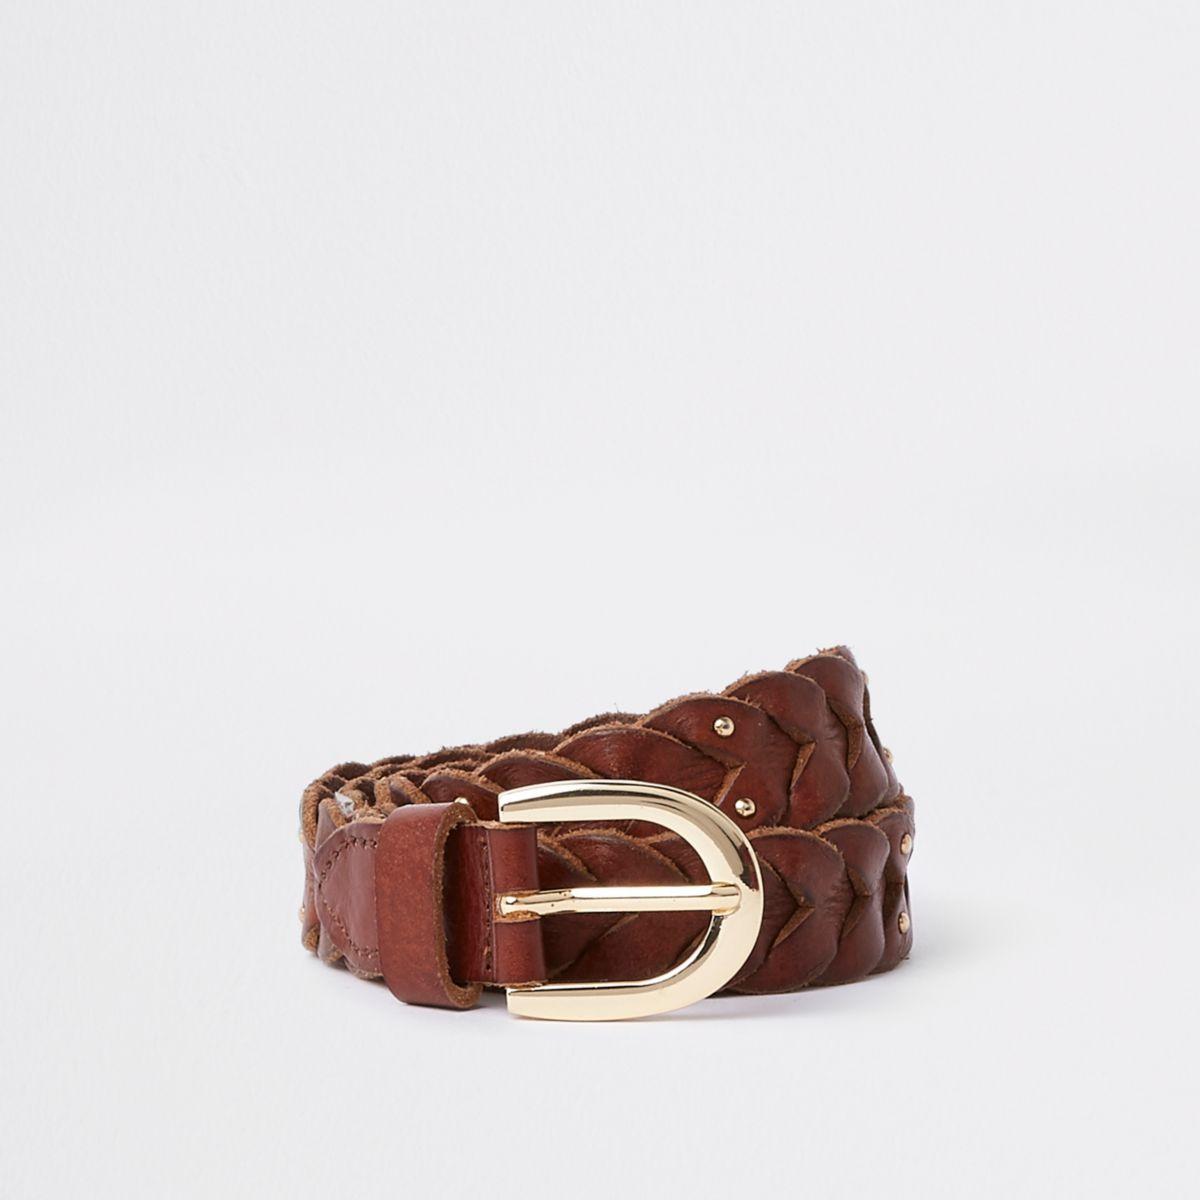 Brown leather stud plaited jeans belt